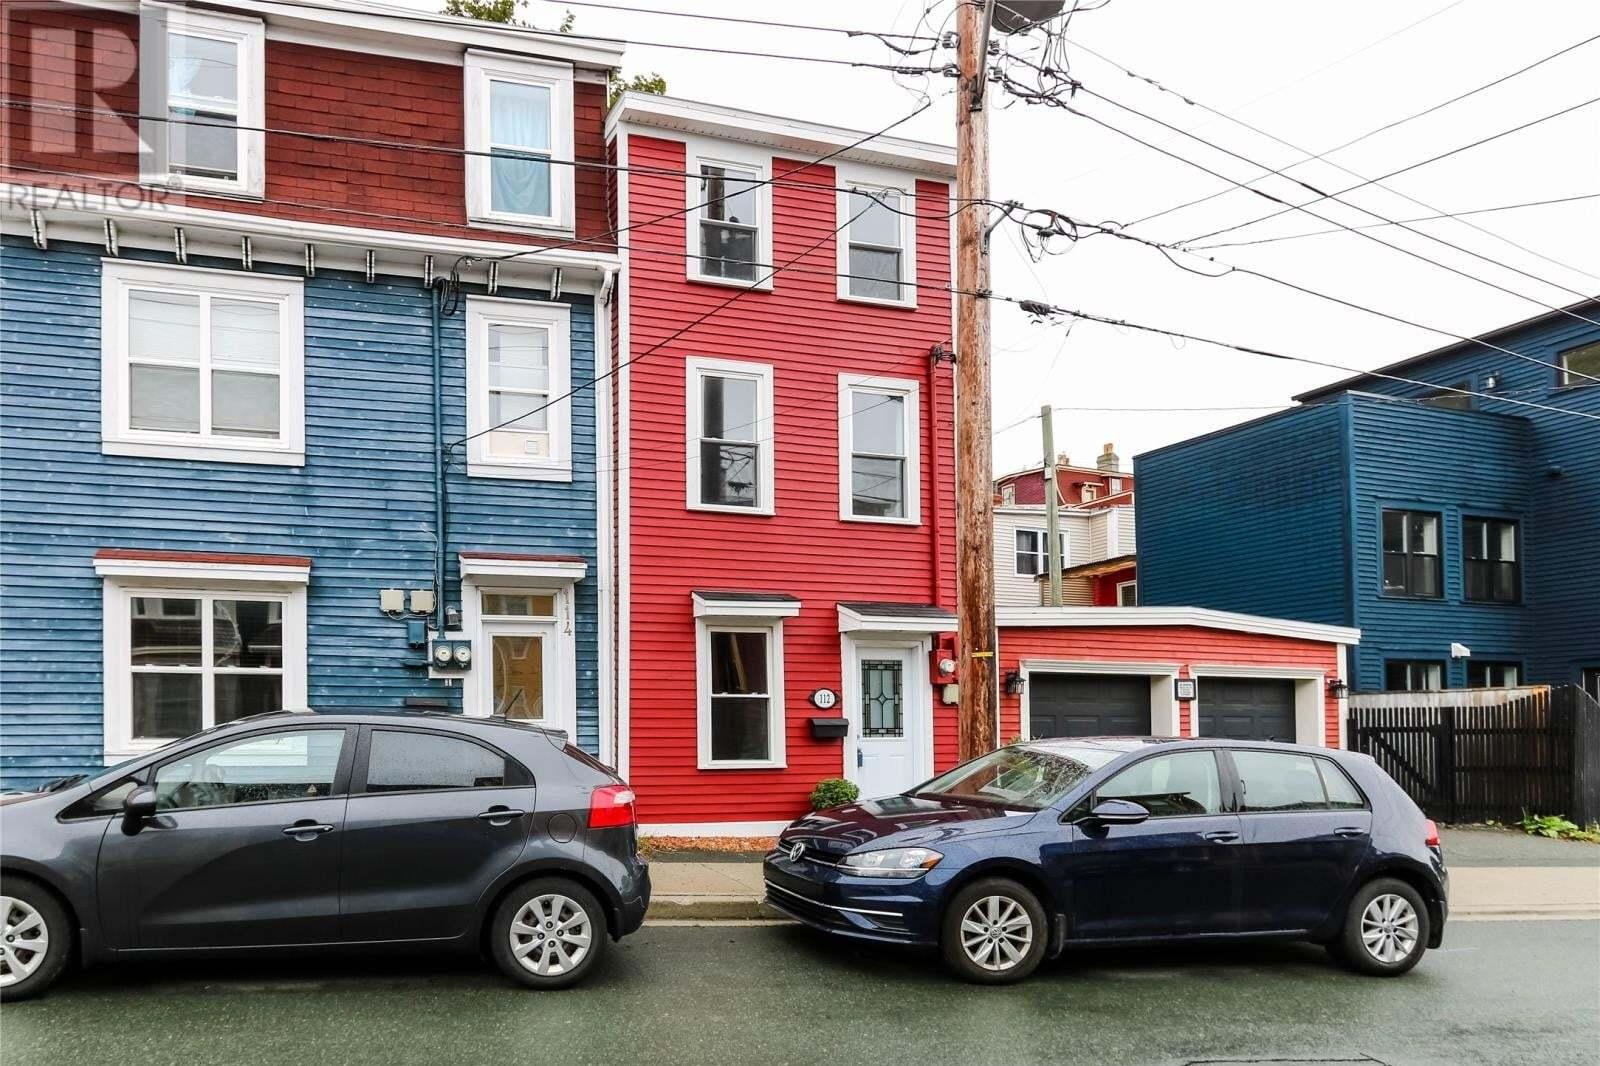 House for sale at 112 Bond St St. John's Newfoundland - MLS: 1221103